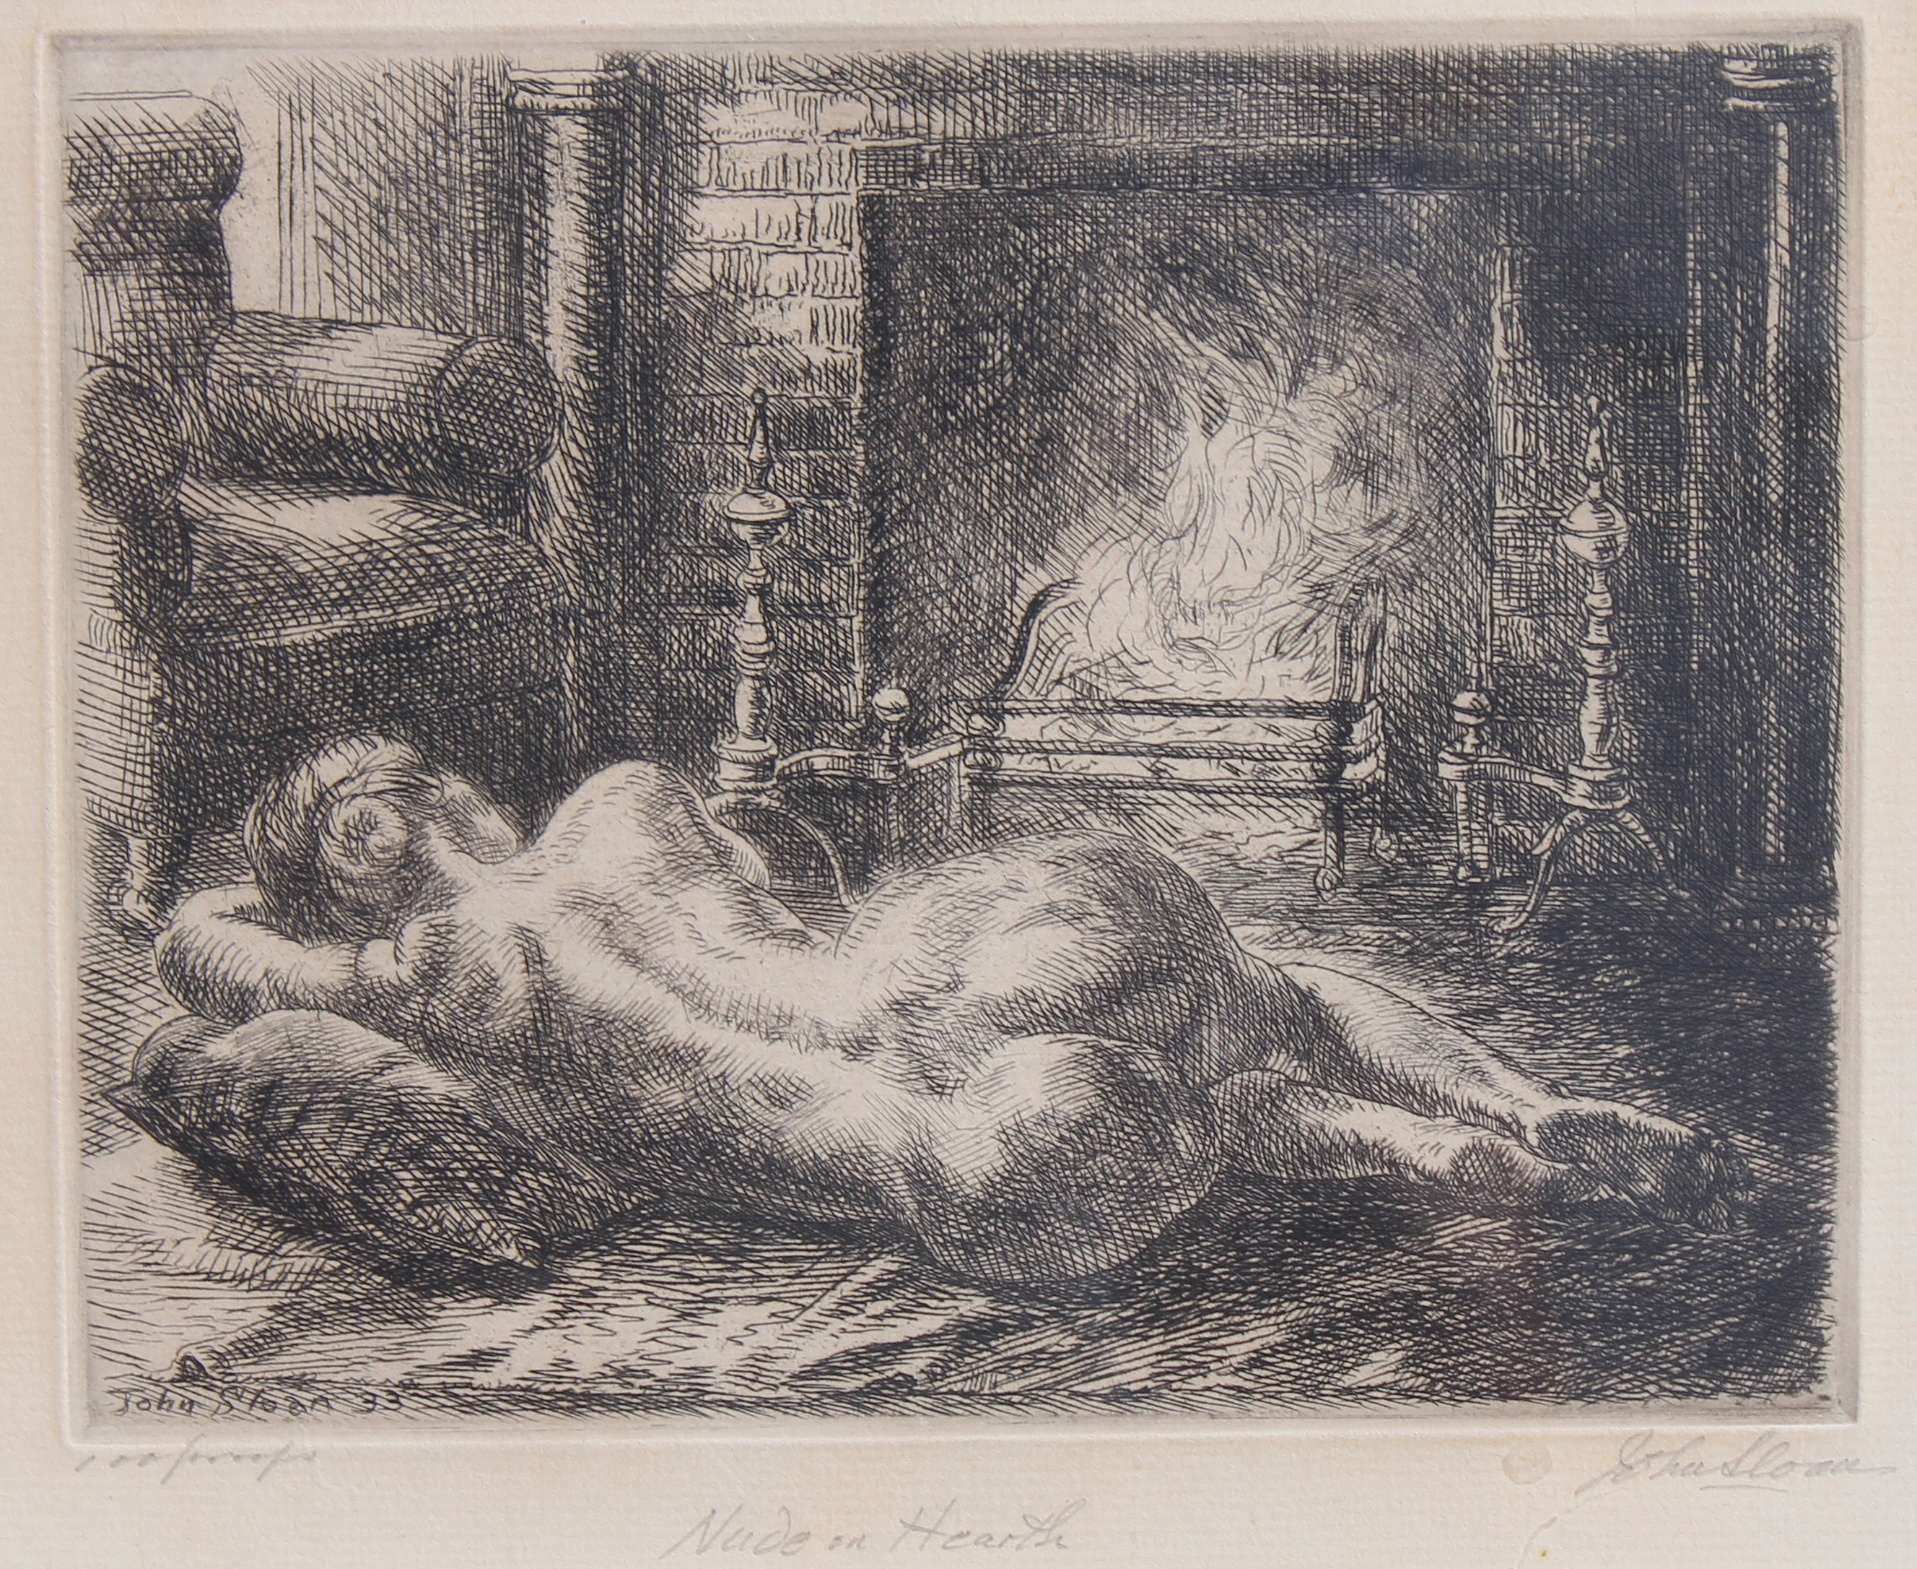 John Sloan (1871 - 1951) Nude Etching